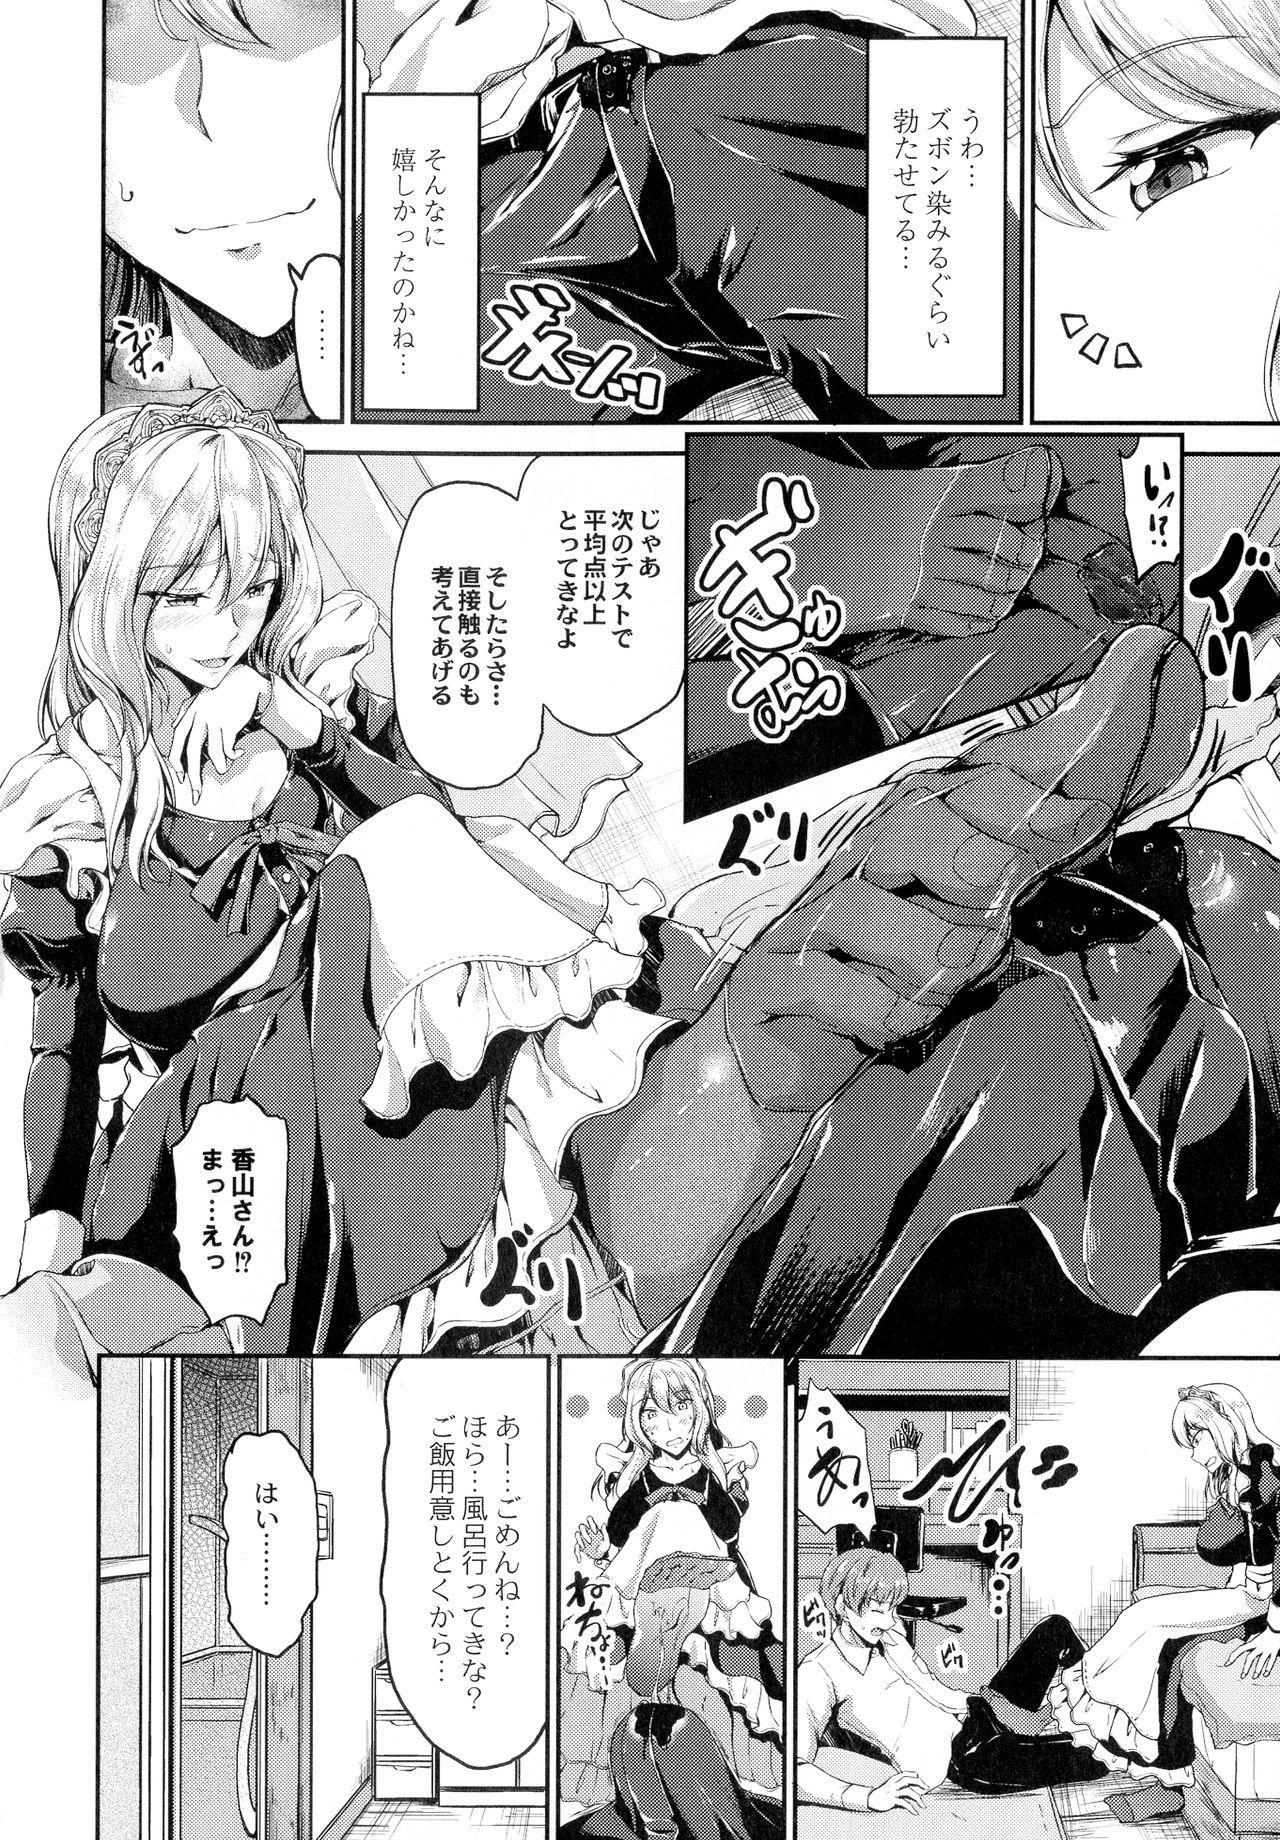 Sweet Maid World 159